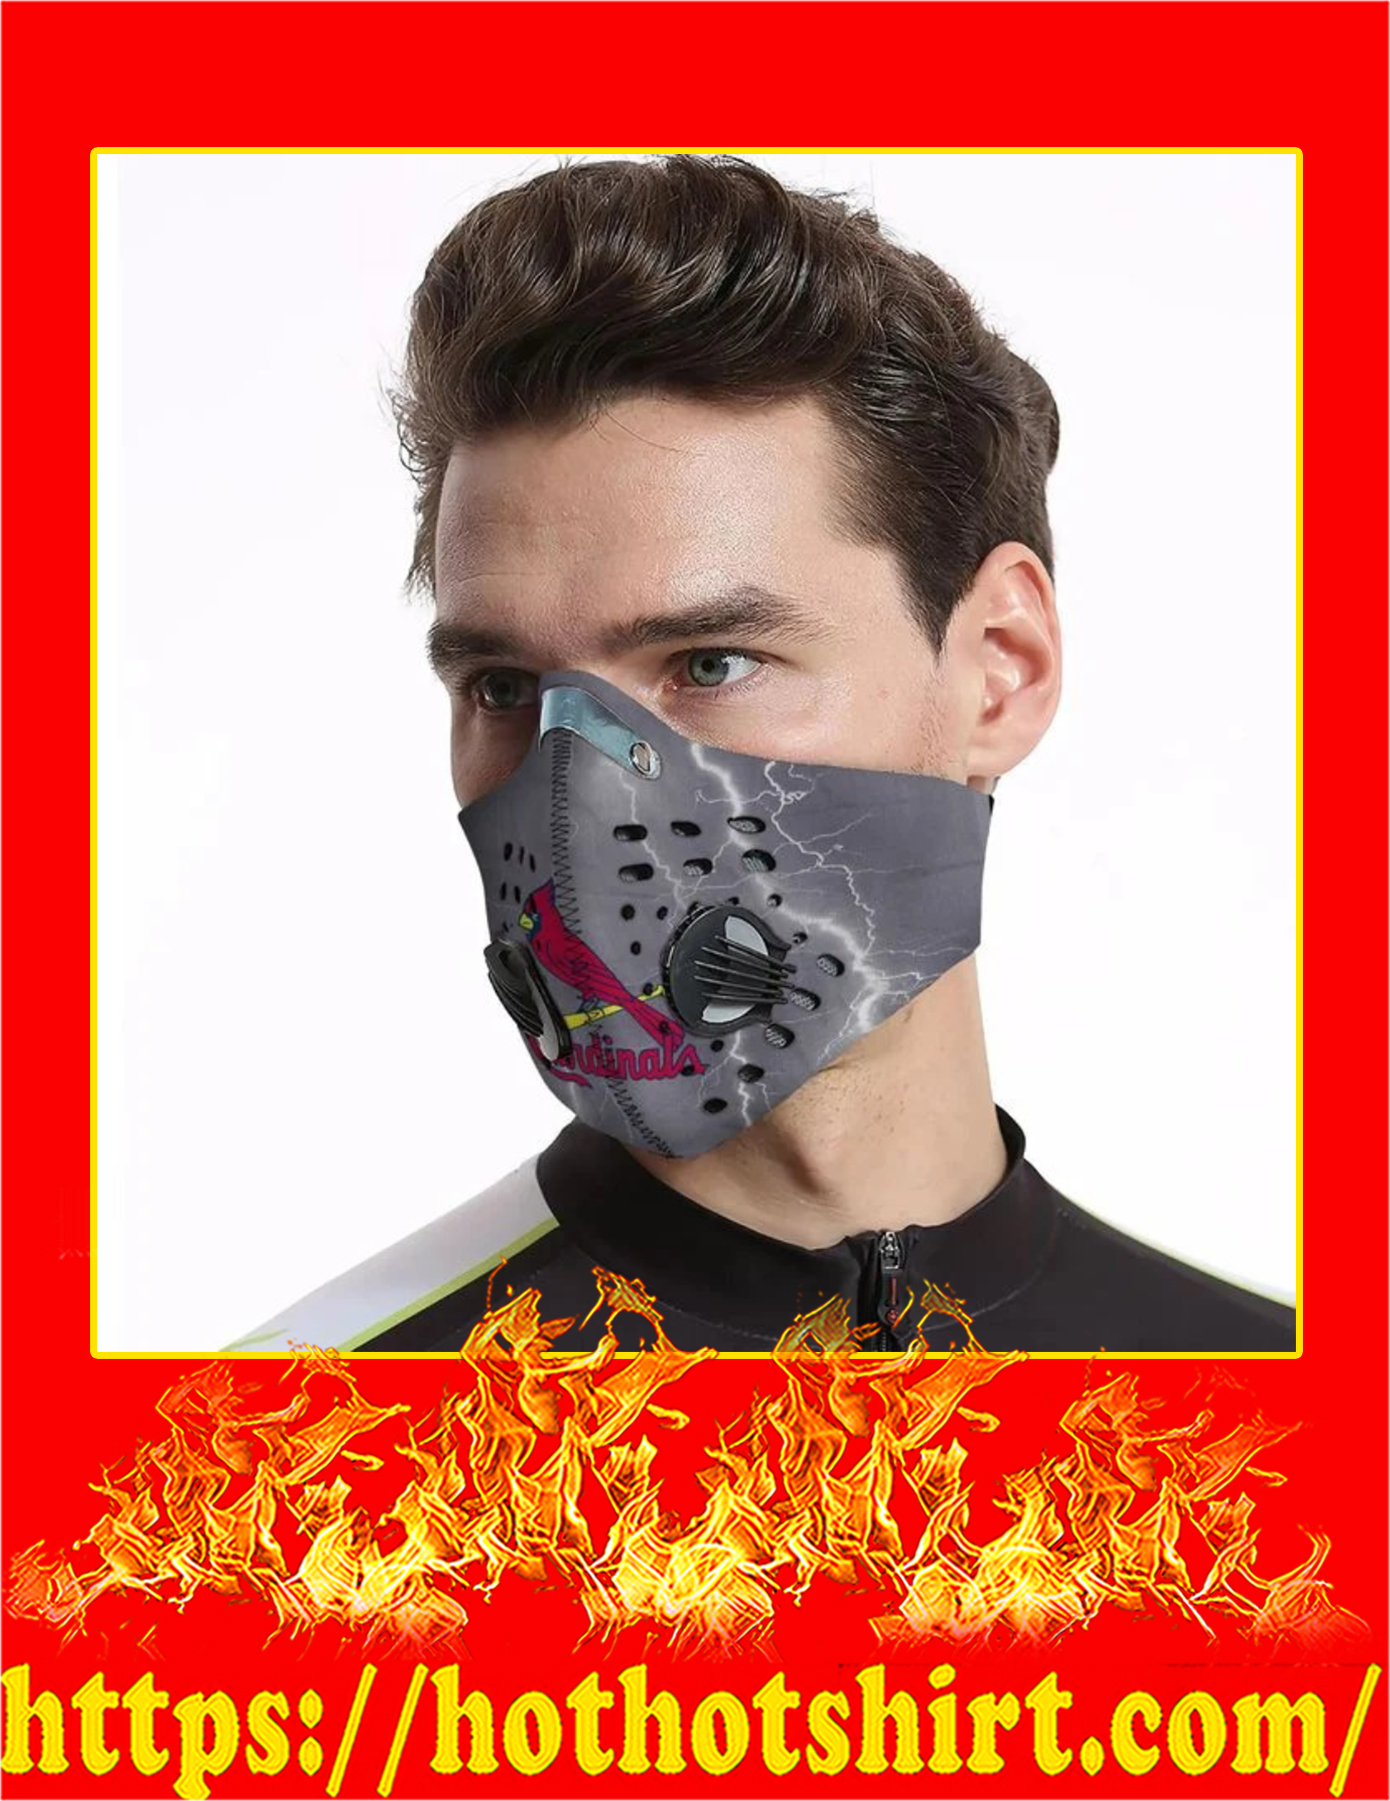 St louis cardinals filter face mask - Pic 3